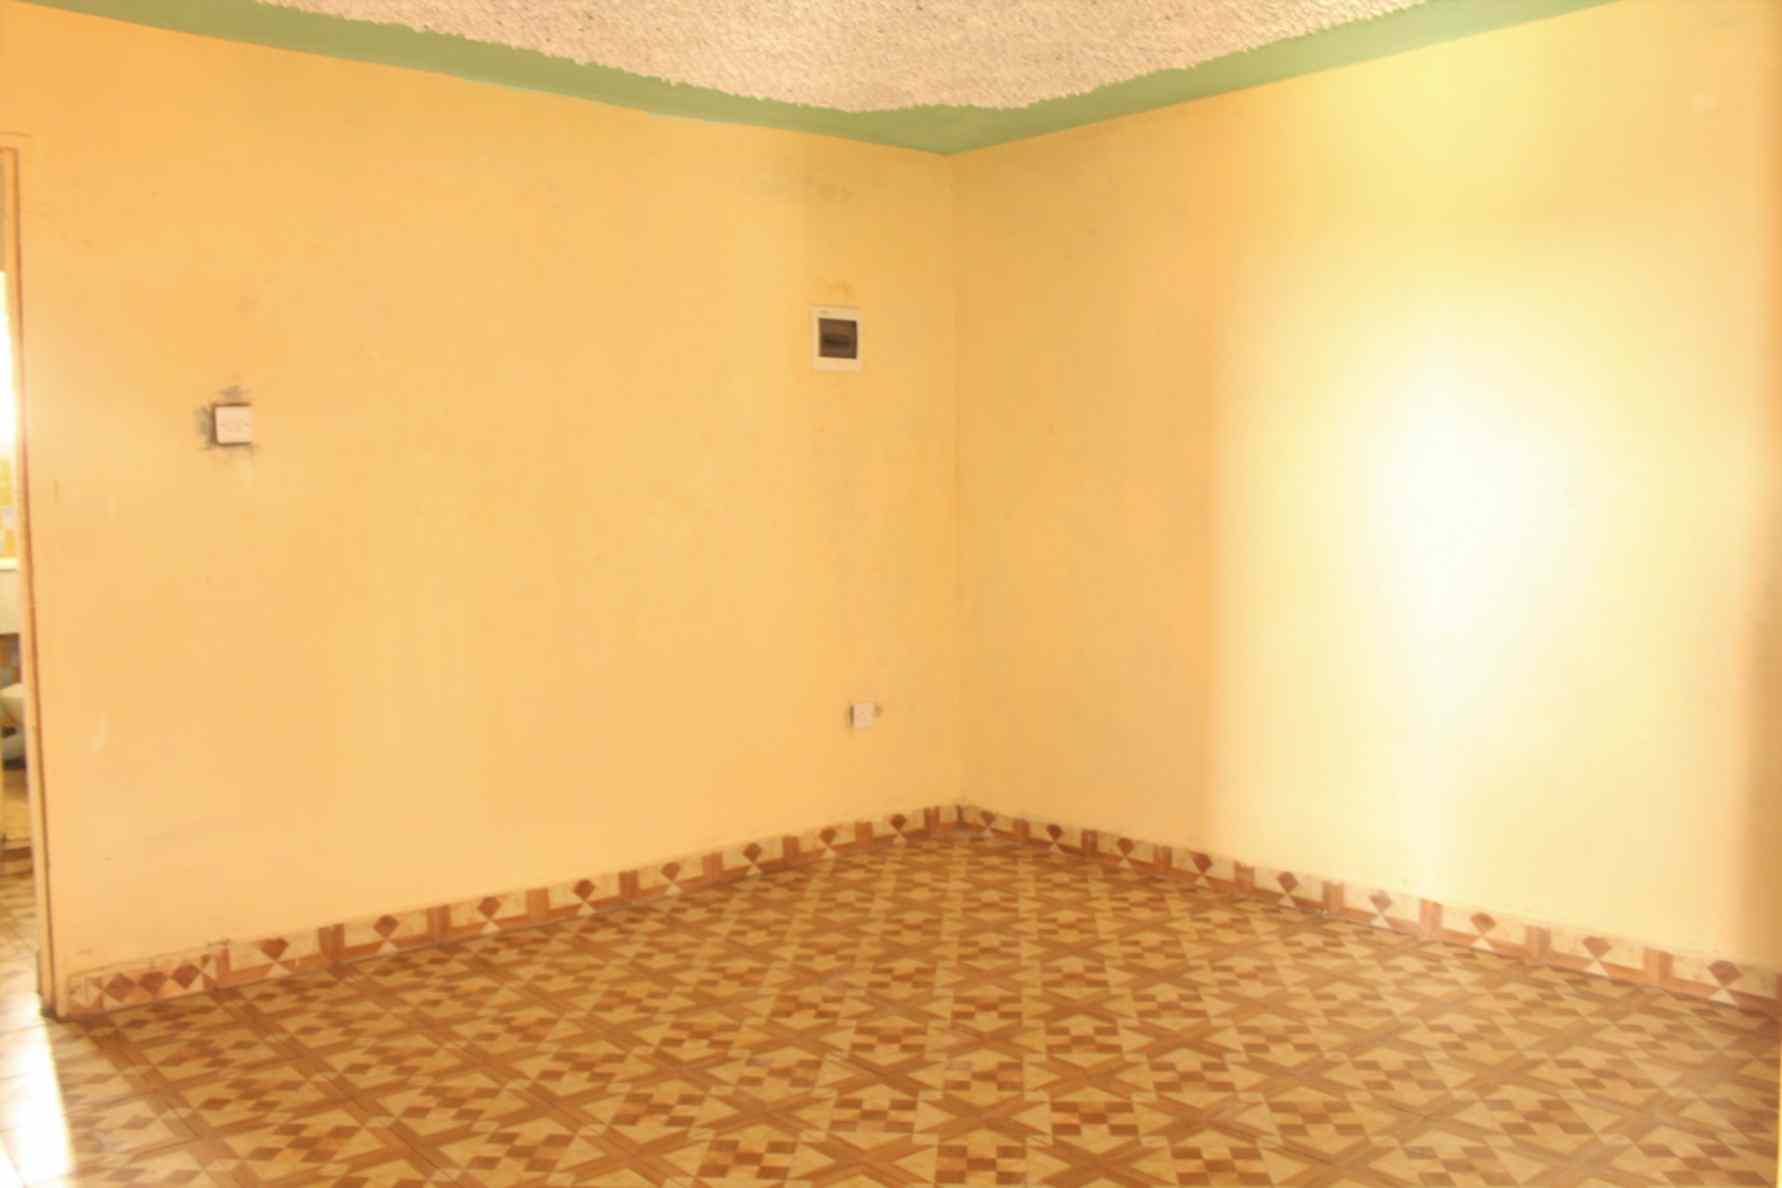 1 and 2 bedroom flat for rent in Kinoo 87